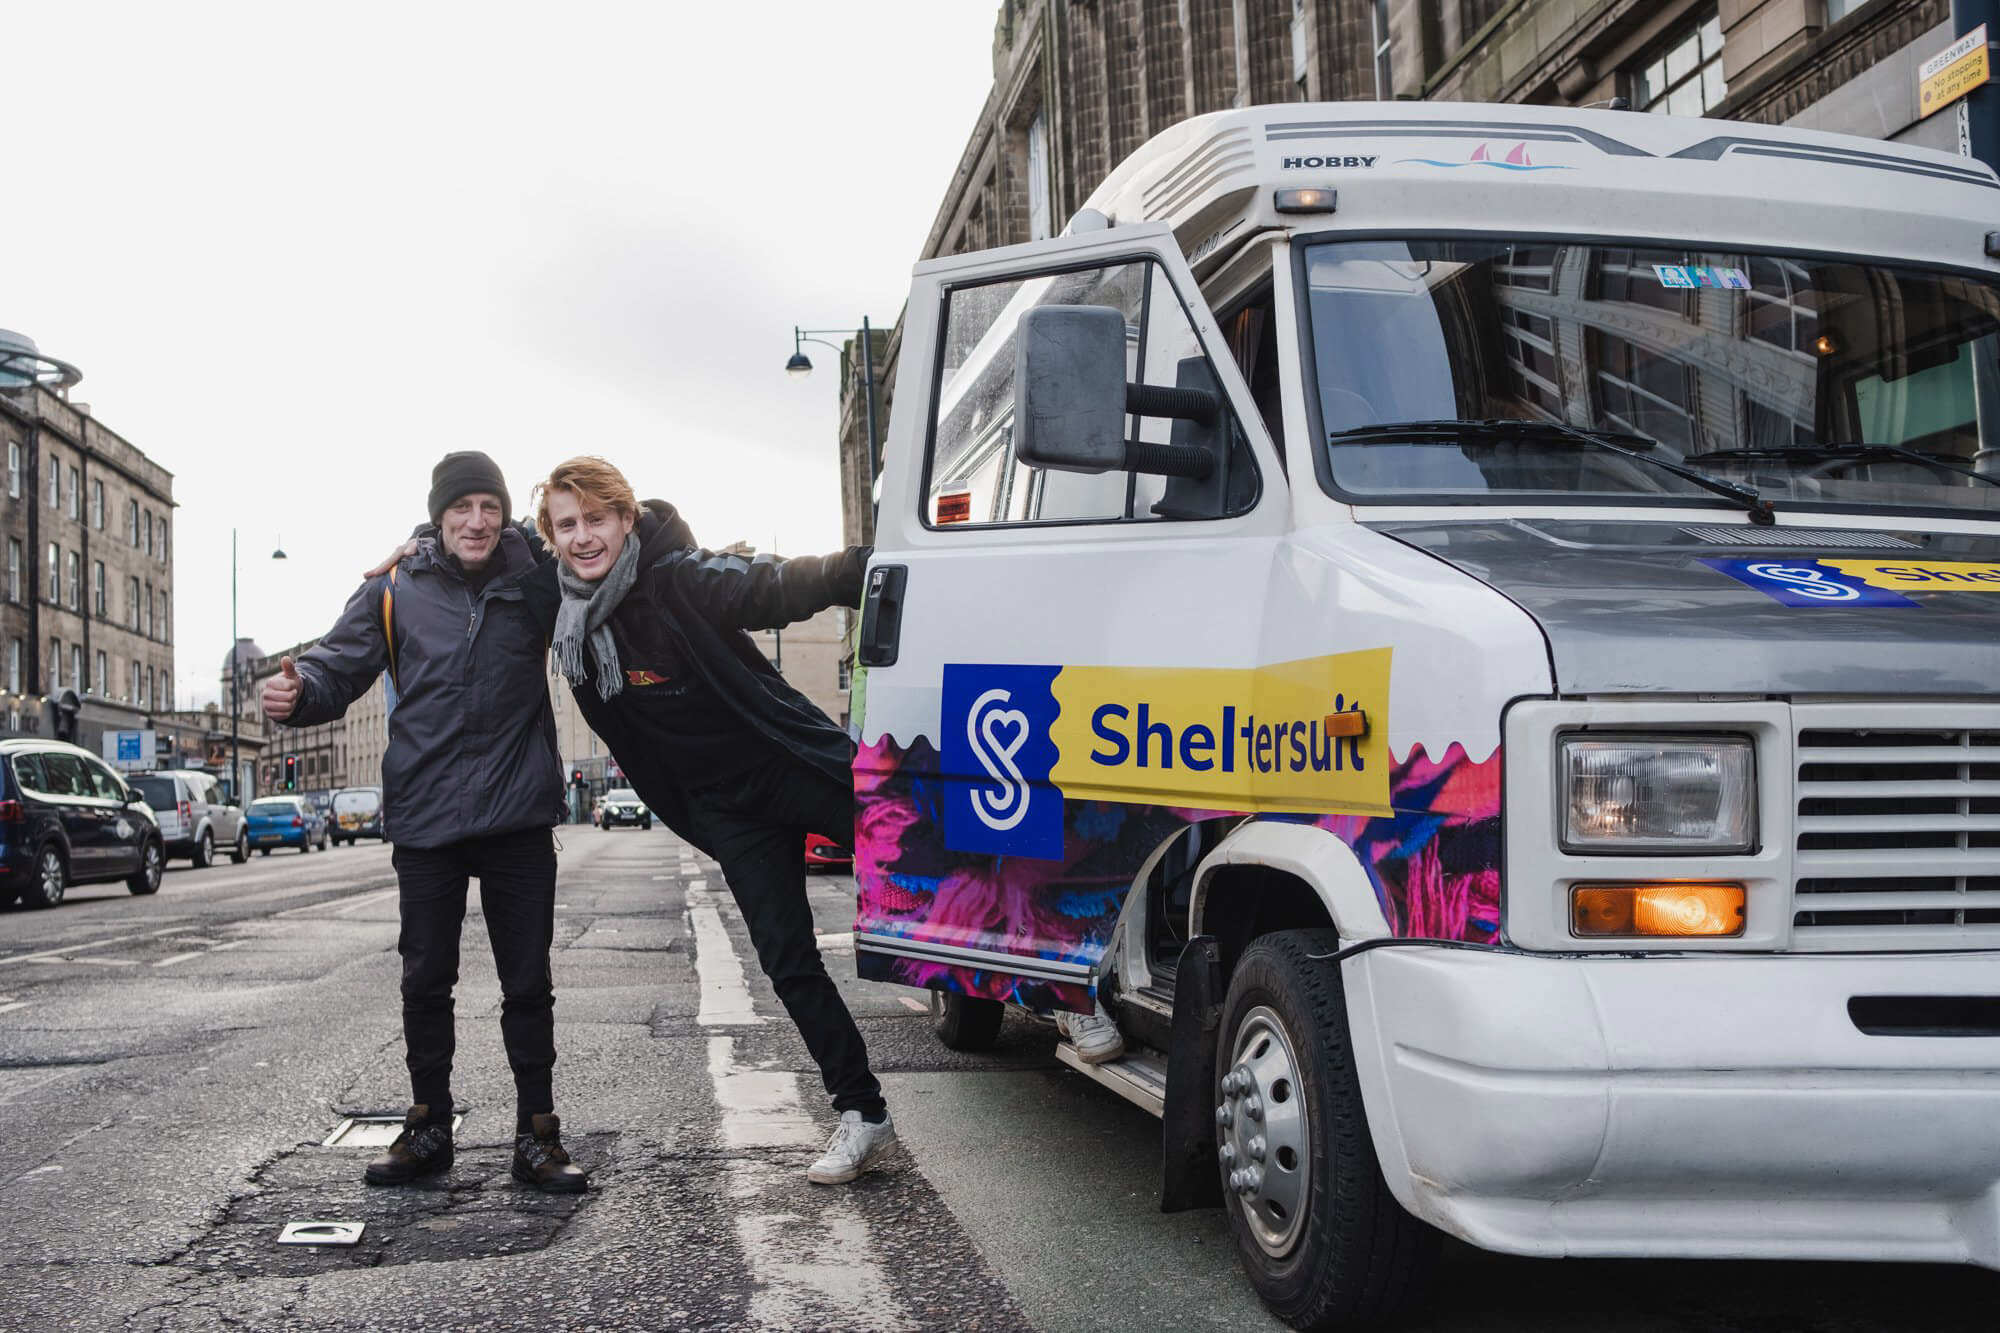 Groot-Brittannië tweede halte op Europese Sheltersuit Tour